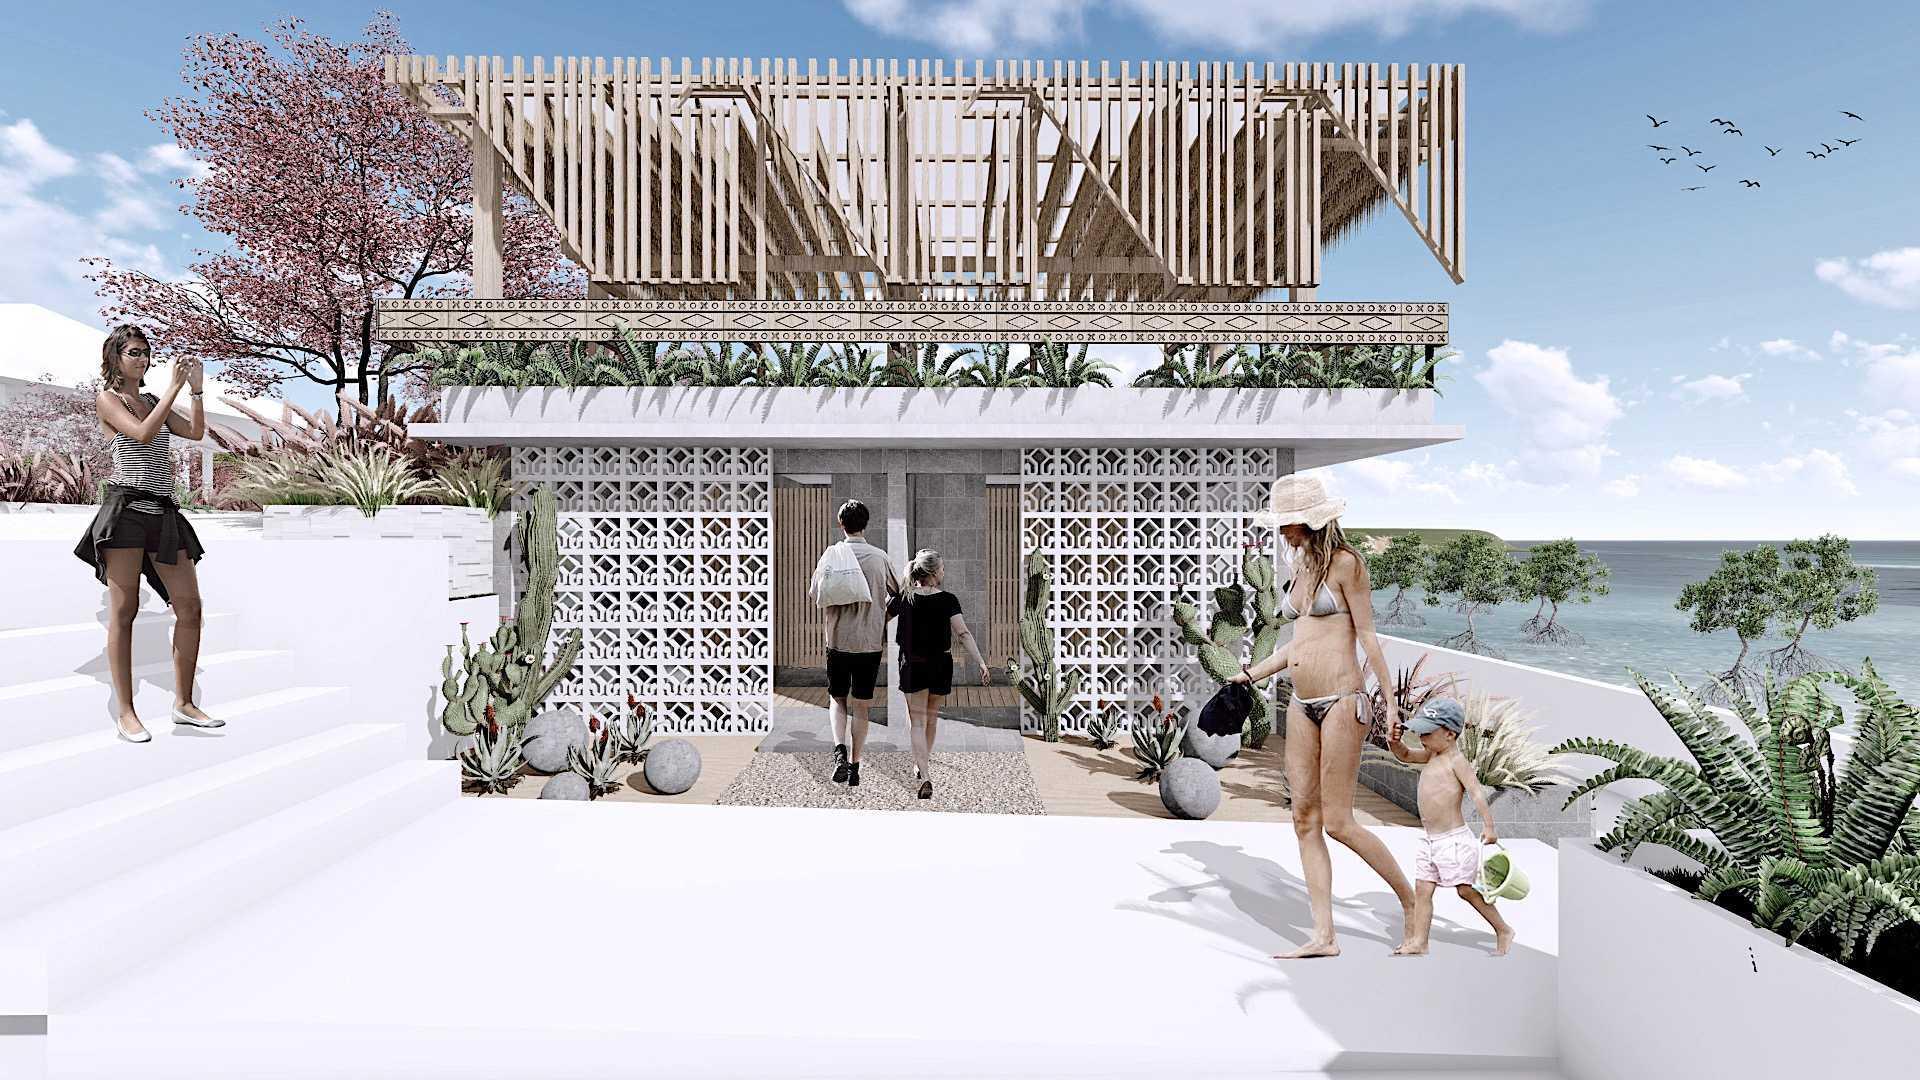 Studio Asri Sumba Beach Hotel Pulau Sumba, Nusa Tenggara Tim., Indonesia Pulau Sumba, Nusa Tenggara Tim., Indonesia Studio-Asri-Sumba-Beach-Hotel   100835